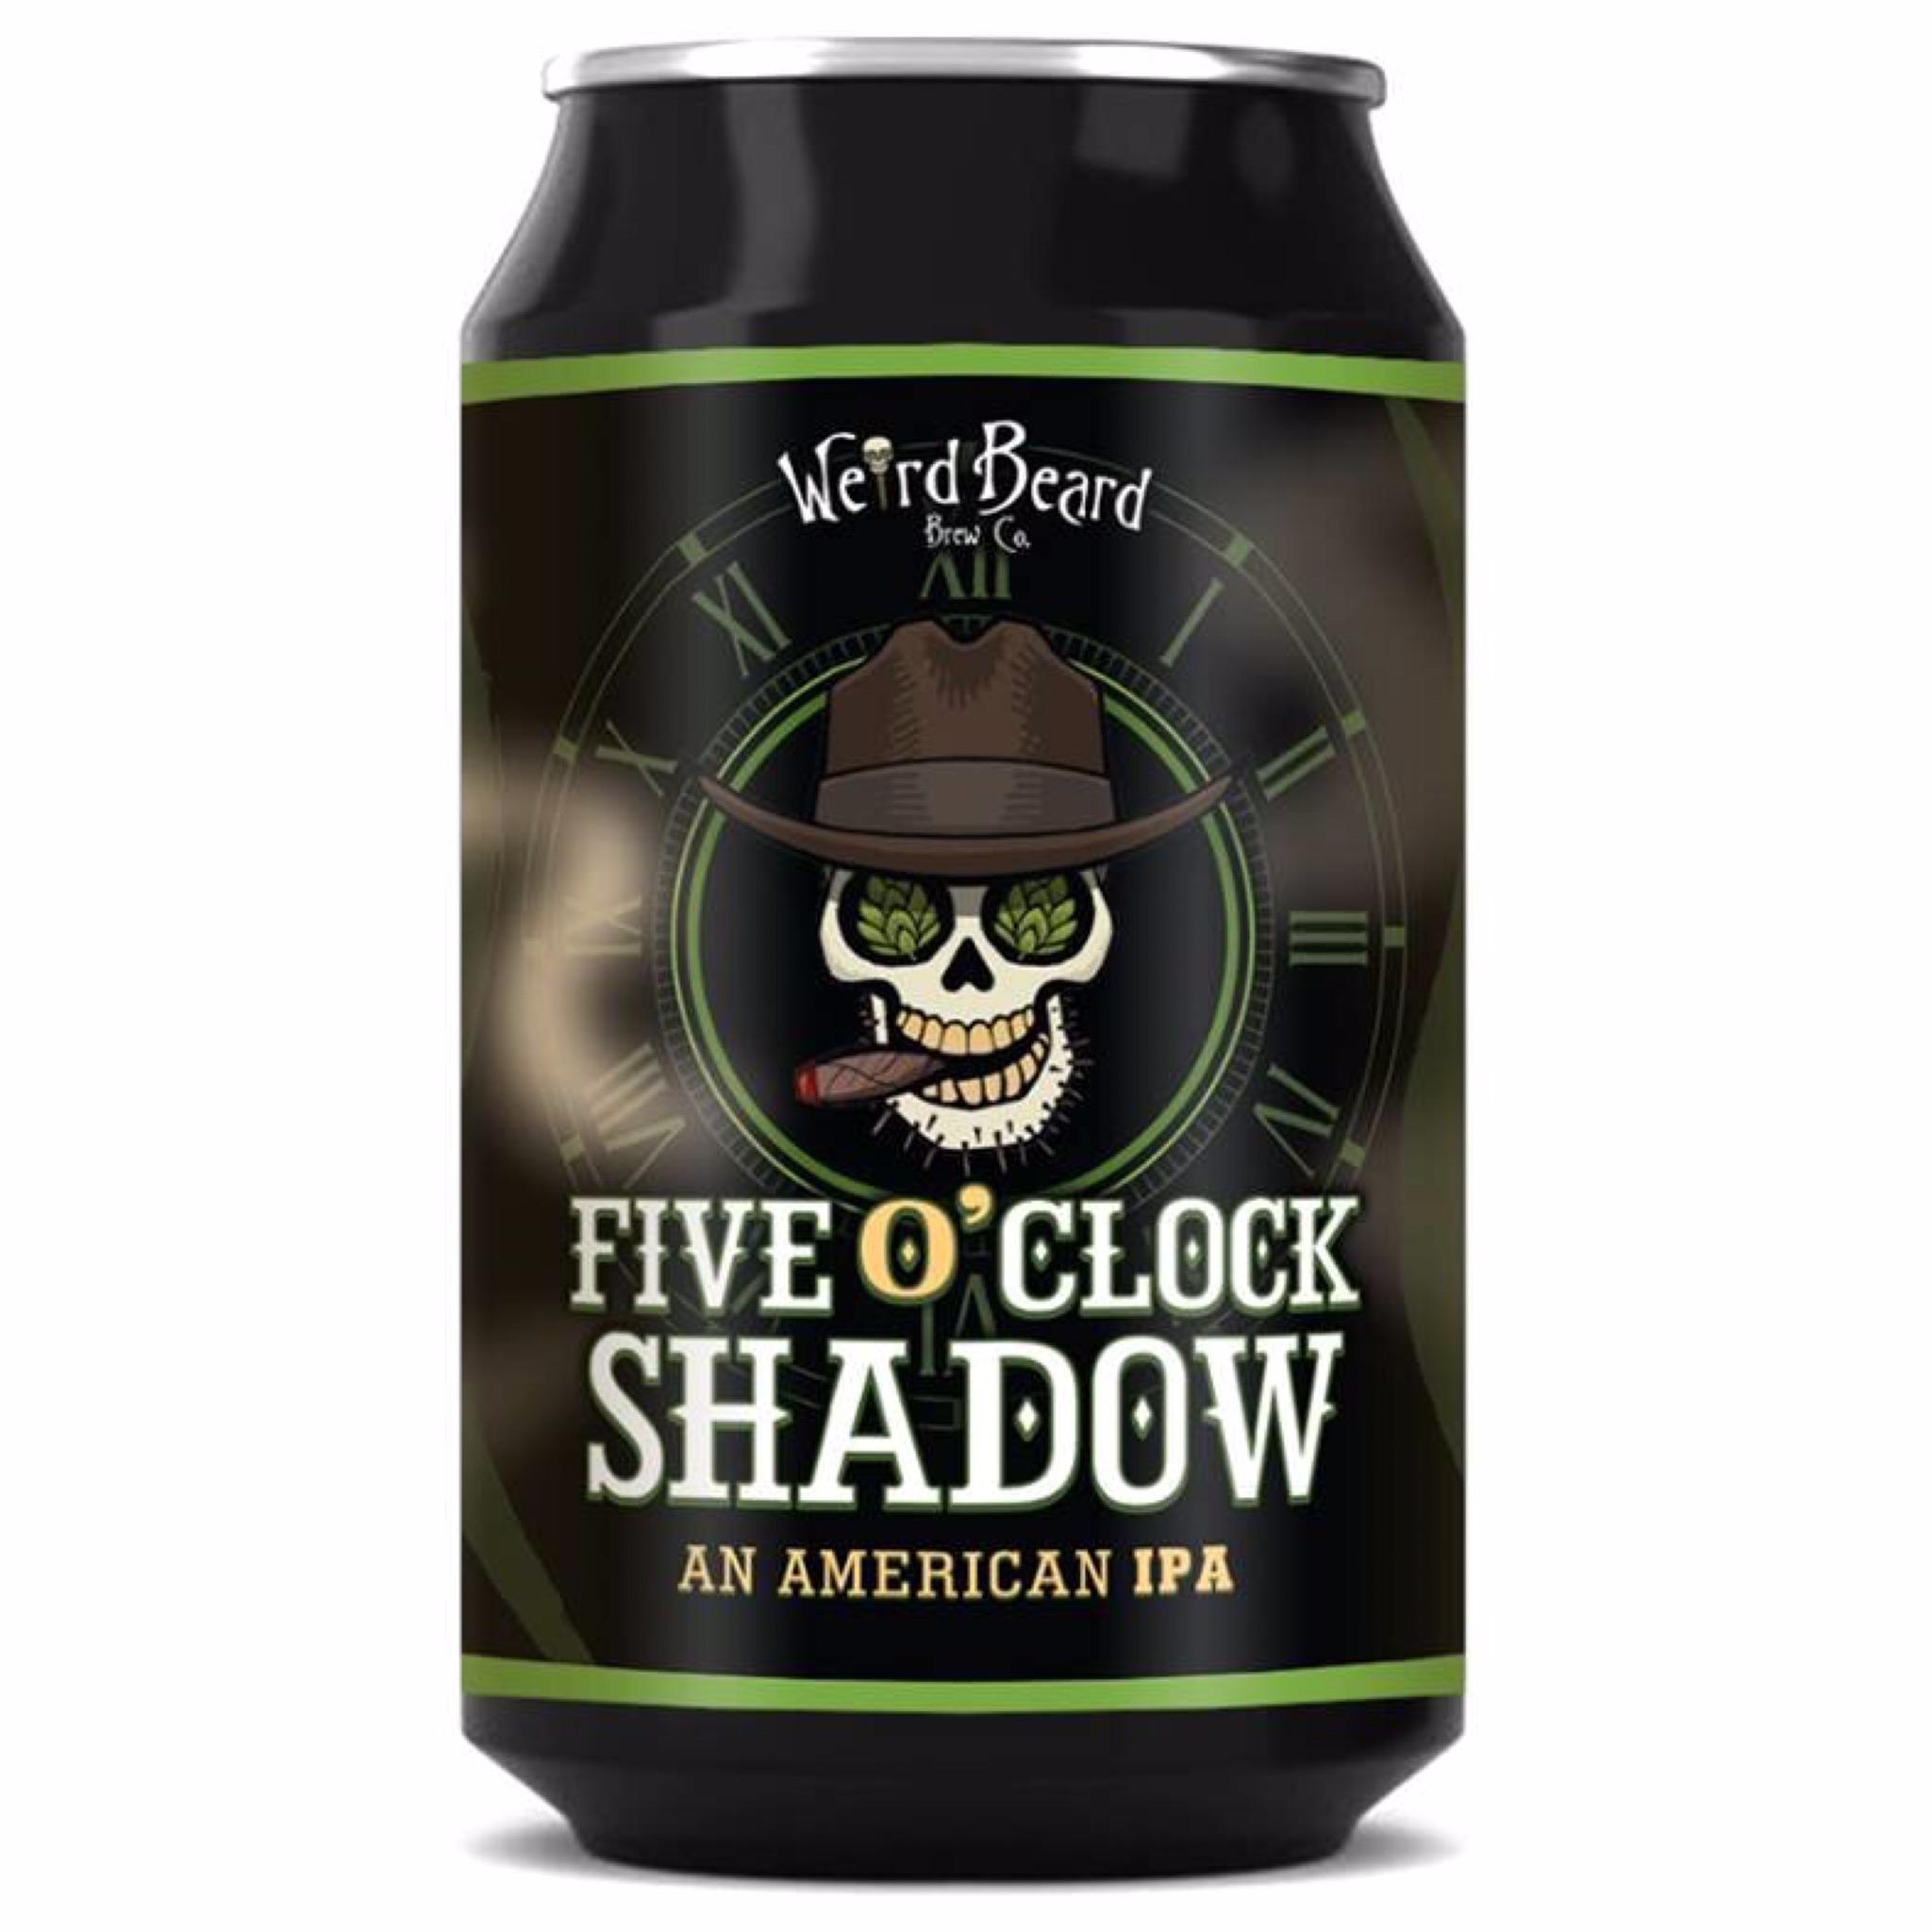 Five O'Clock Shadow American IPA 7% 330ml Weird Beard Brew Co